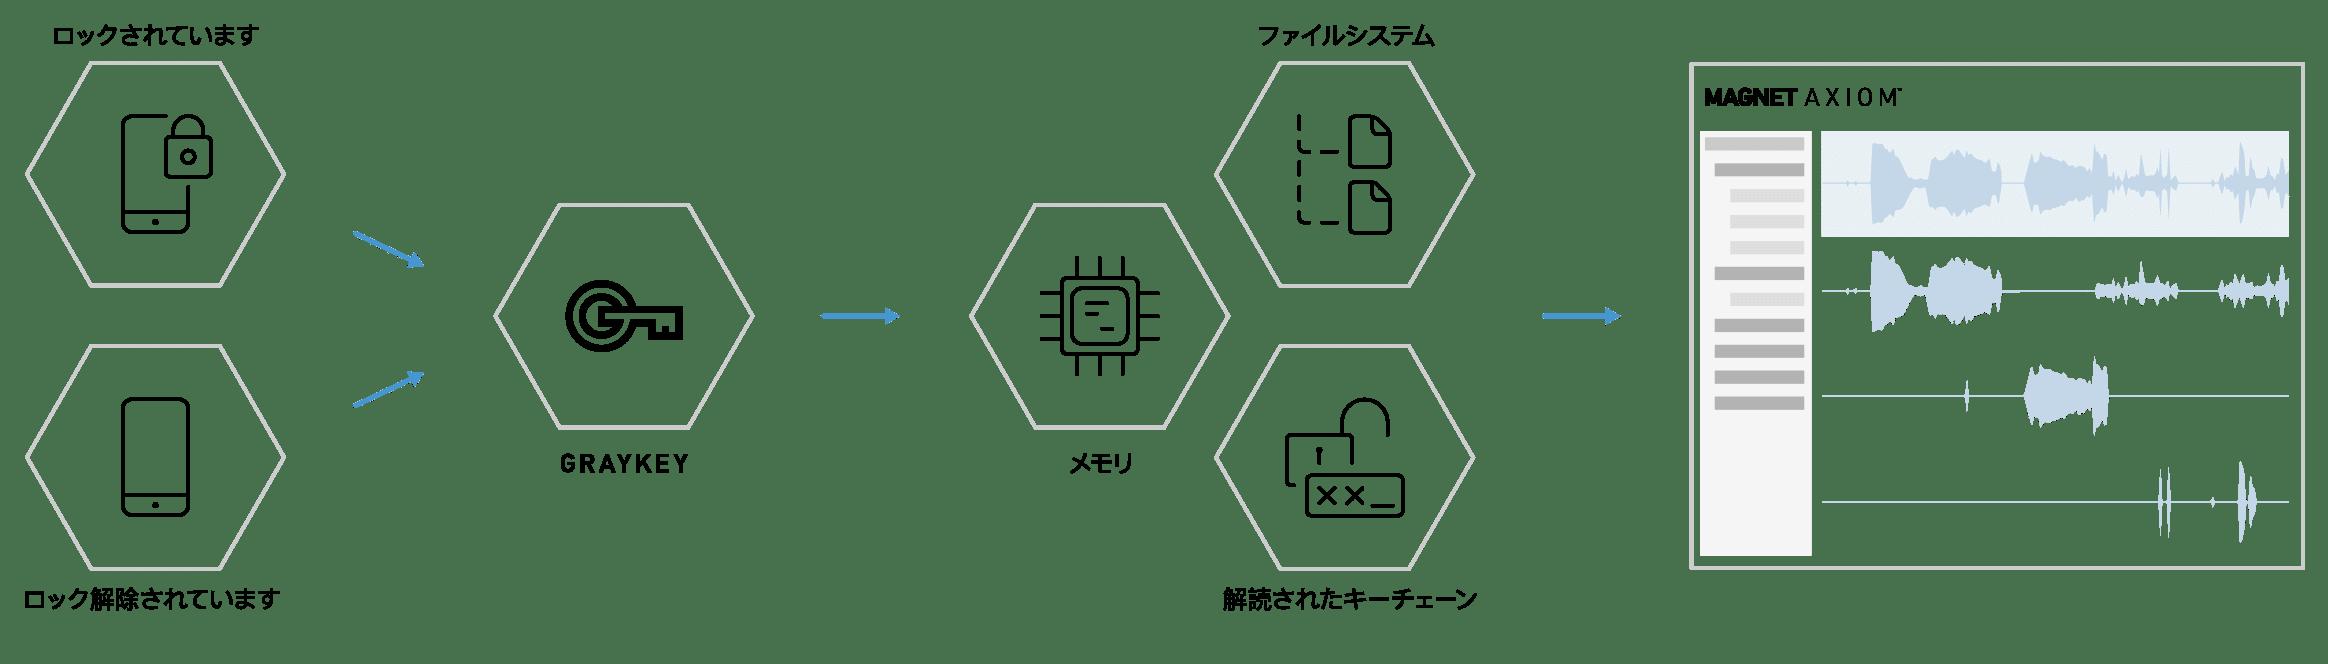 AXIOM GrayKey Diagram